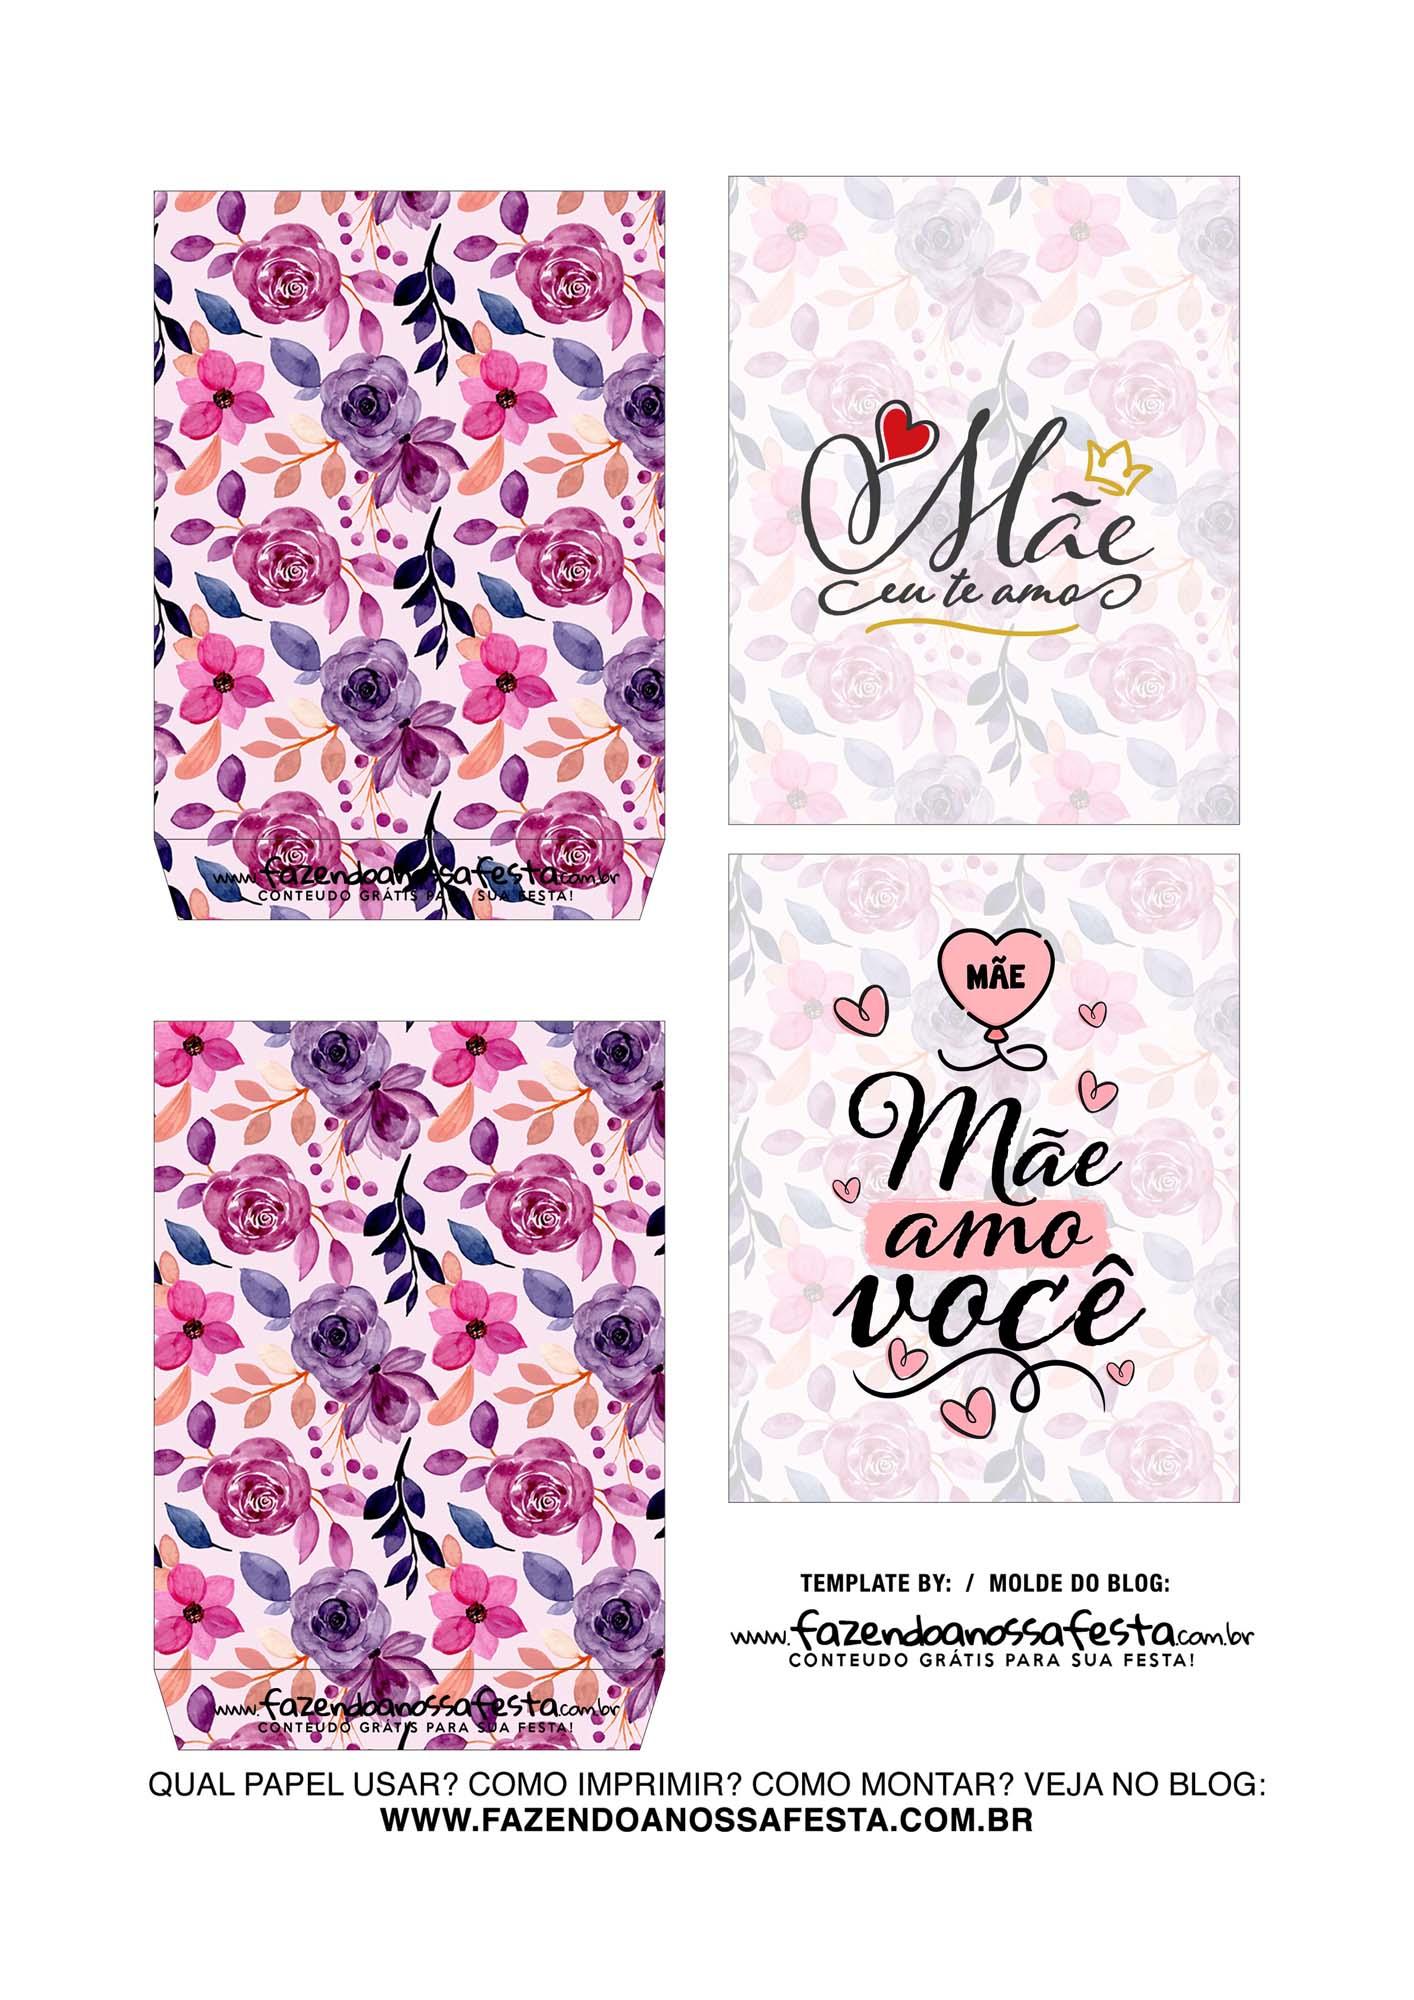 Caixa Explosiva Dia das Maes floral rosa e roxo 3